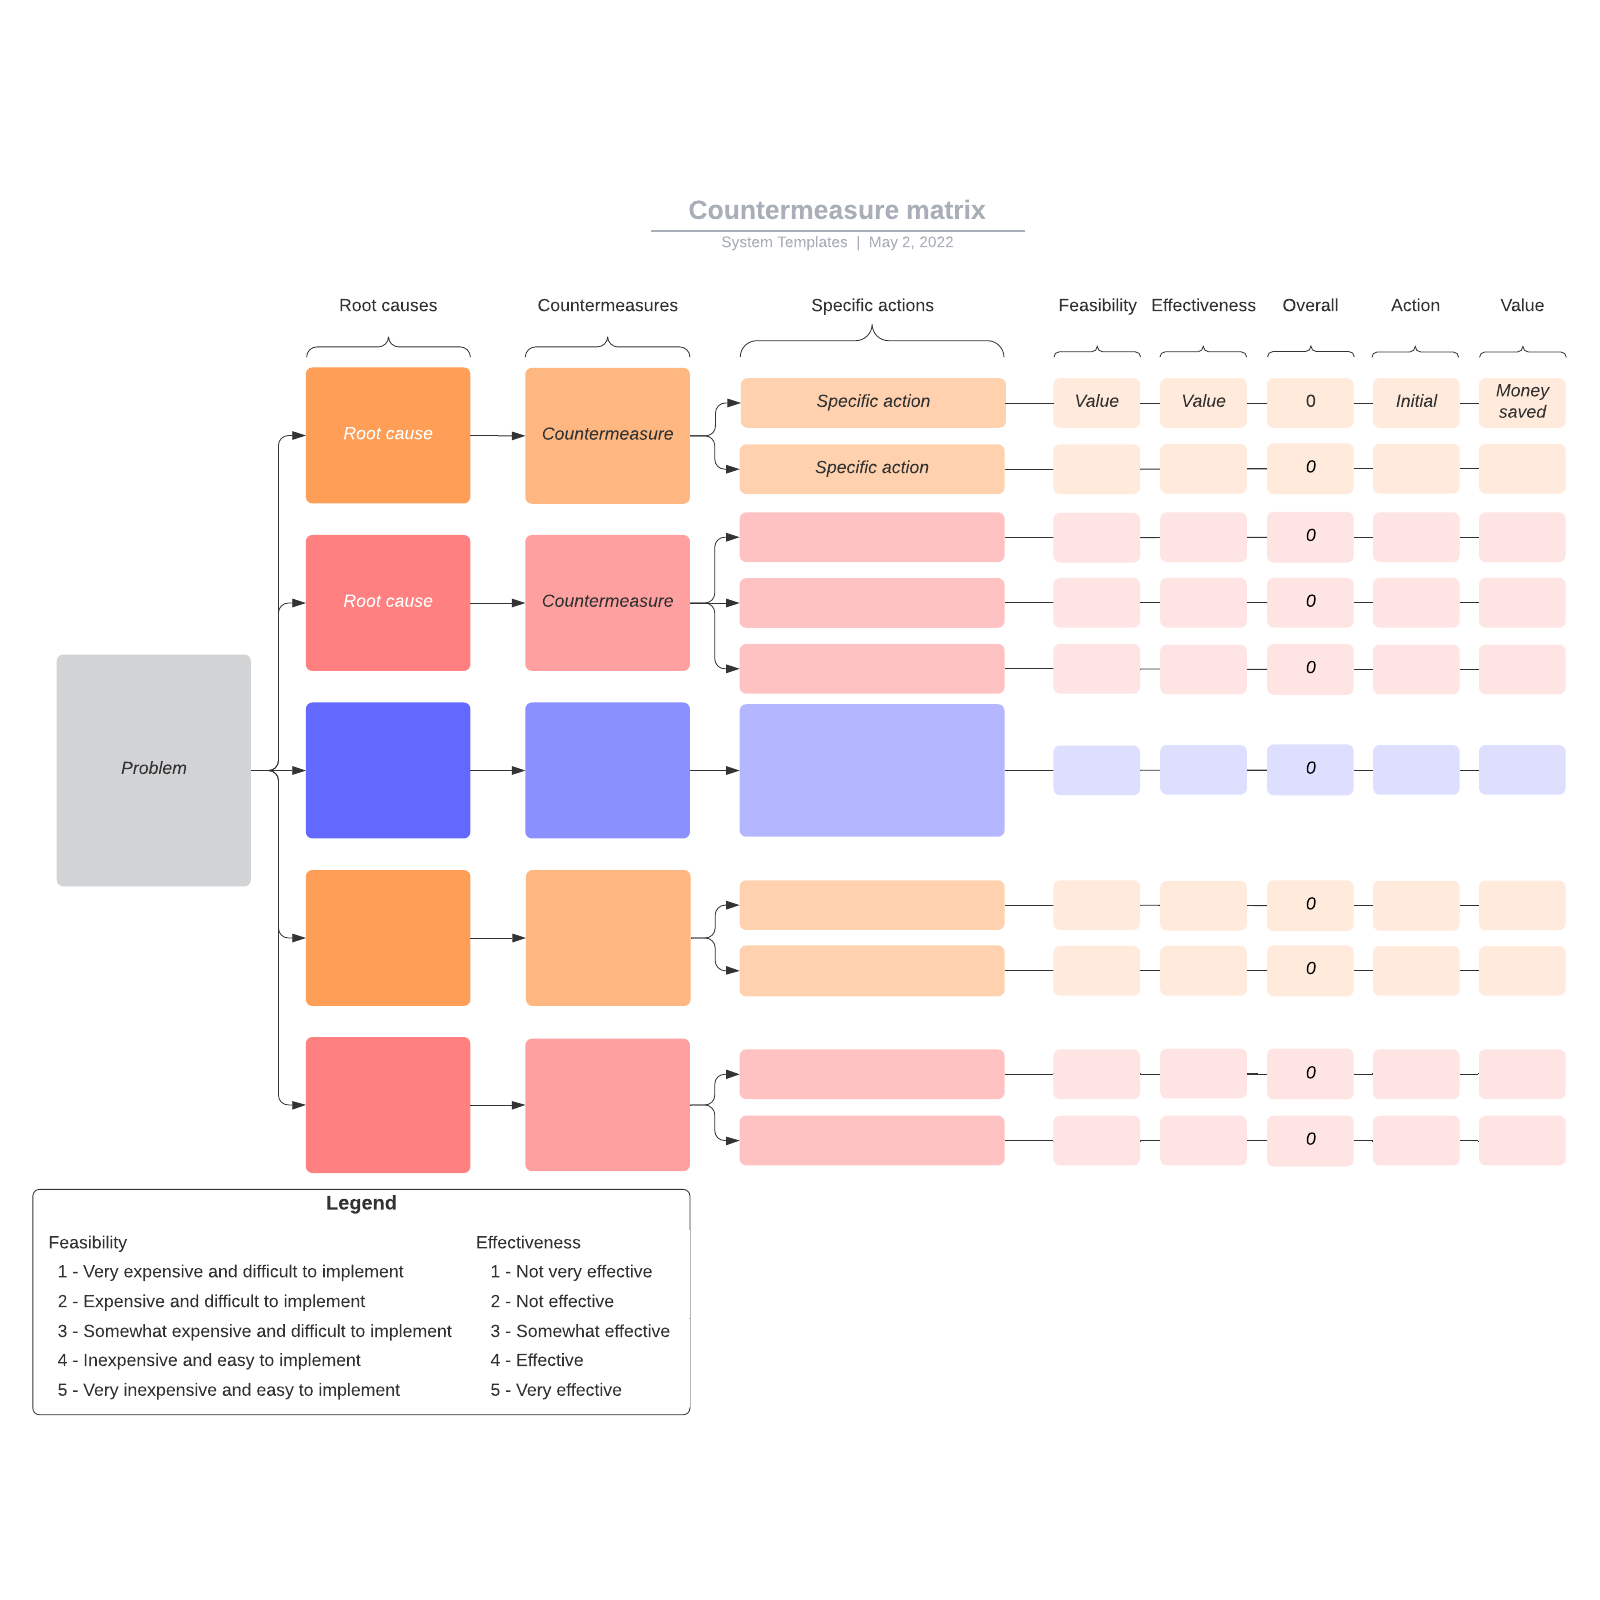 Countermeasure matrix